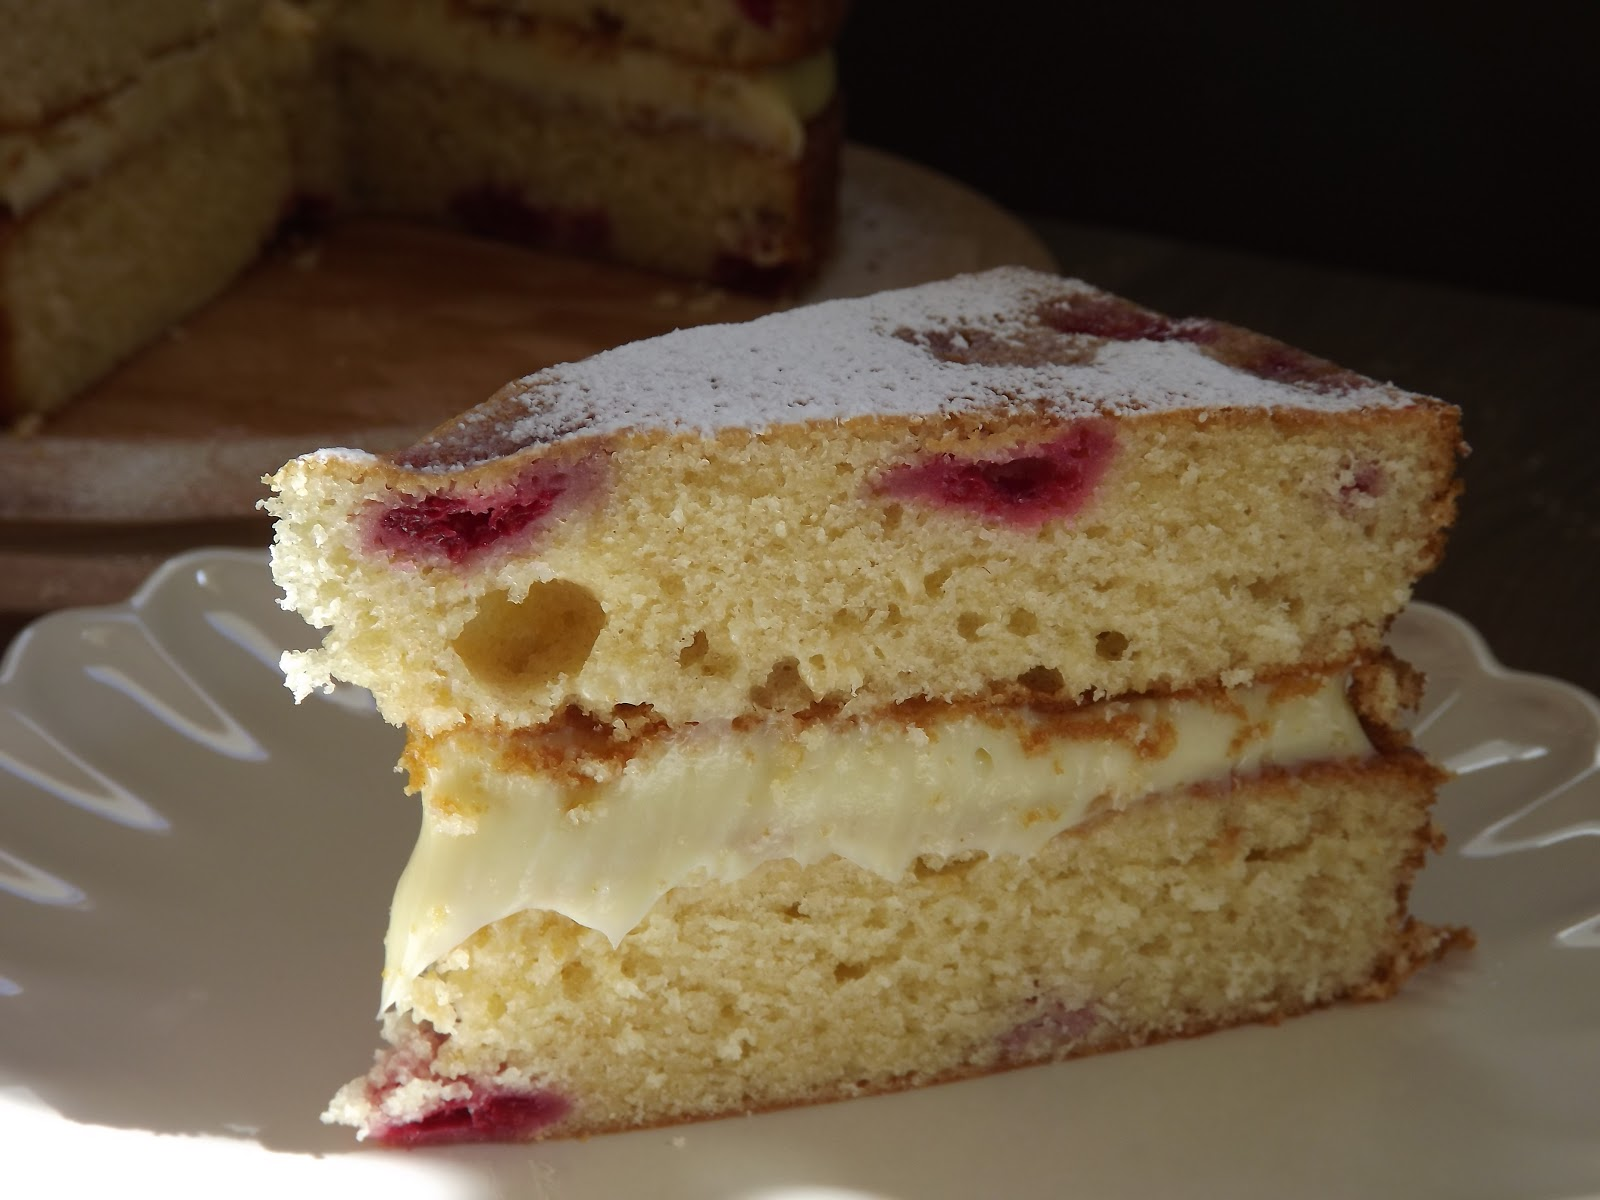 White Chocolate Cake Recipes Uk: Raspberry And White Chocolate Cake